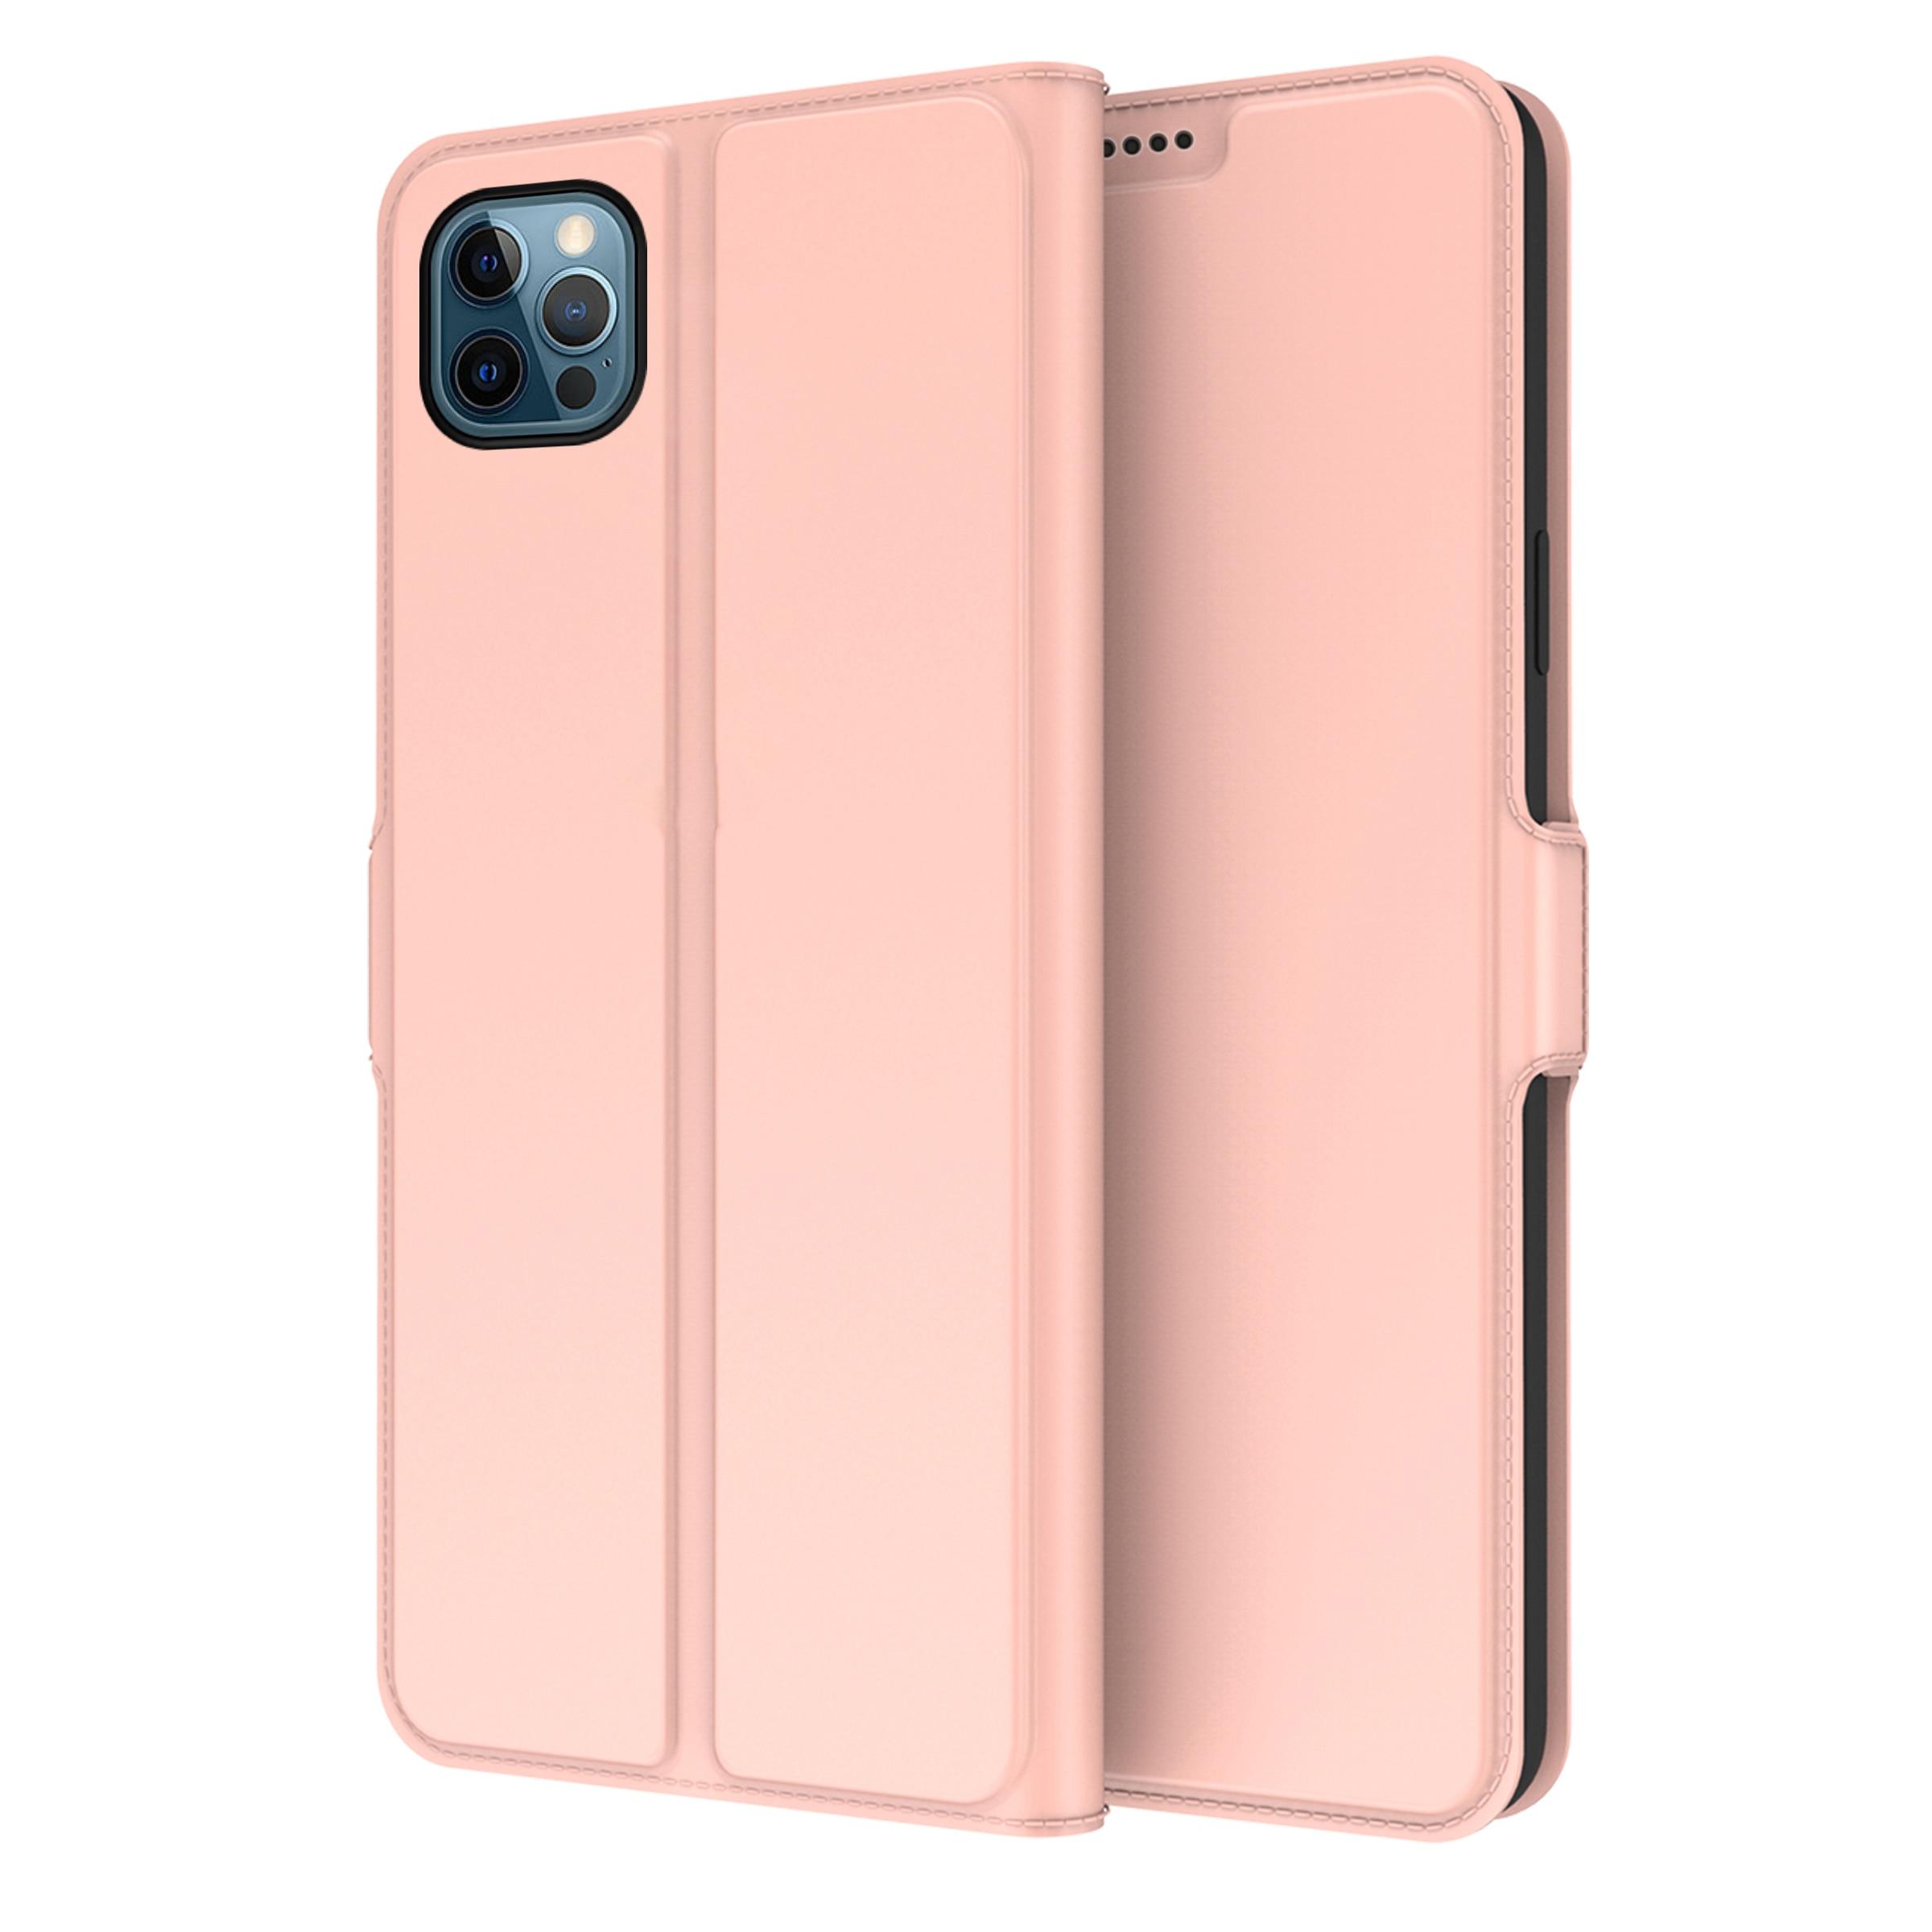 Slim Card Wallet iPhone 13 Pro Max rosegull